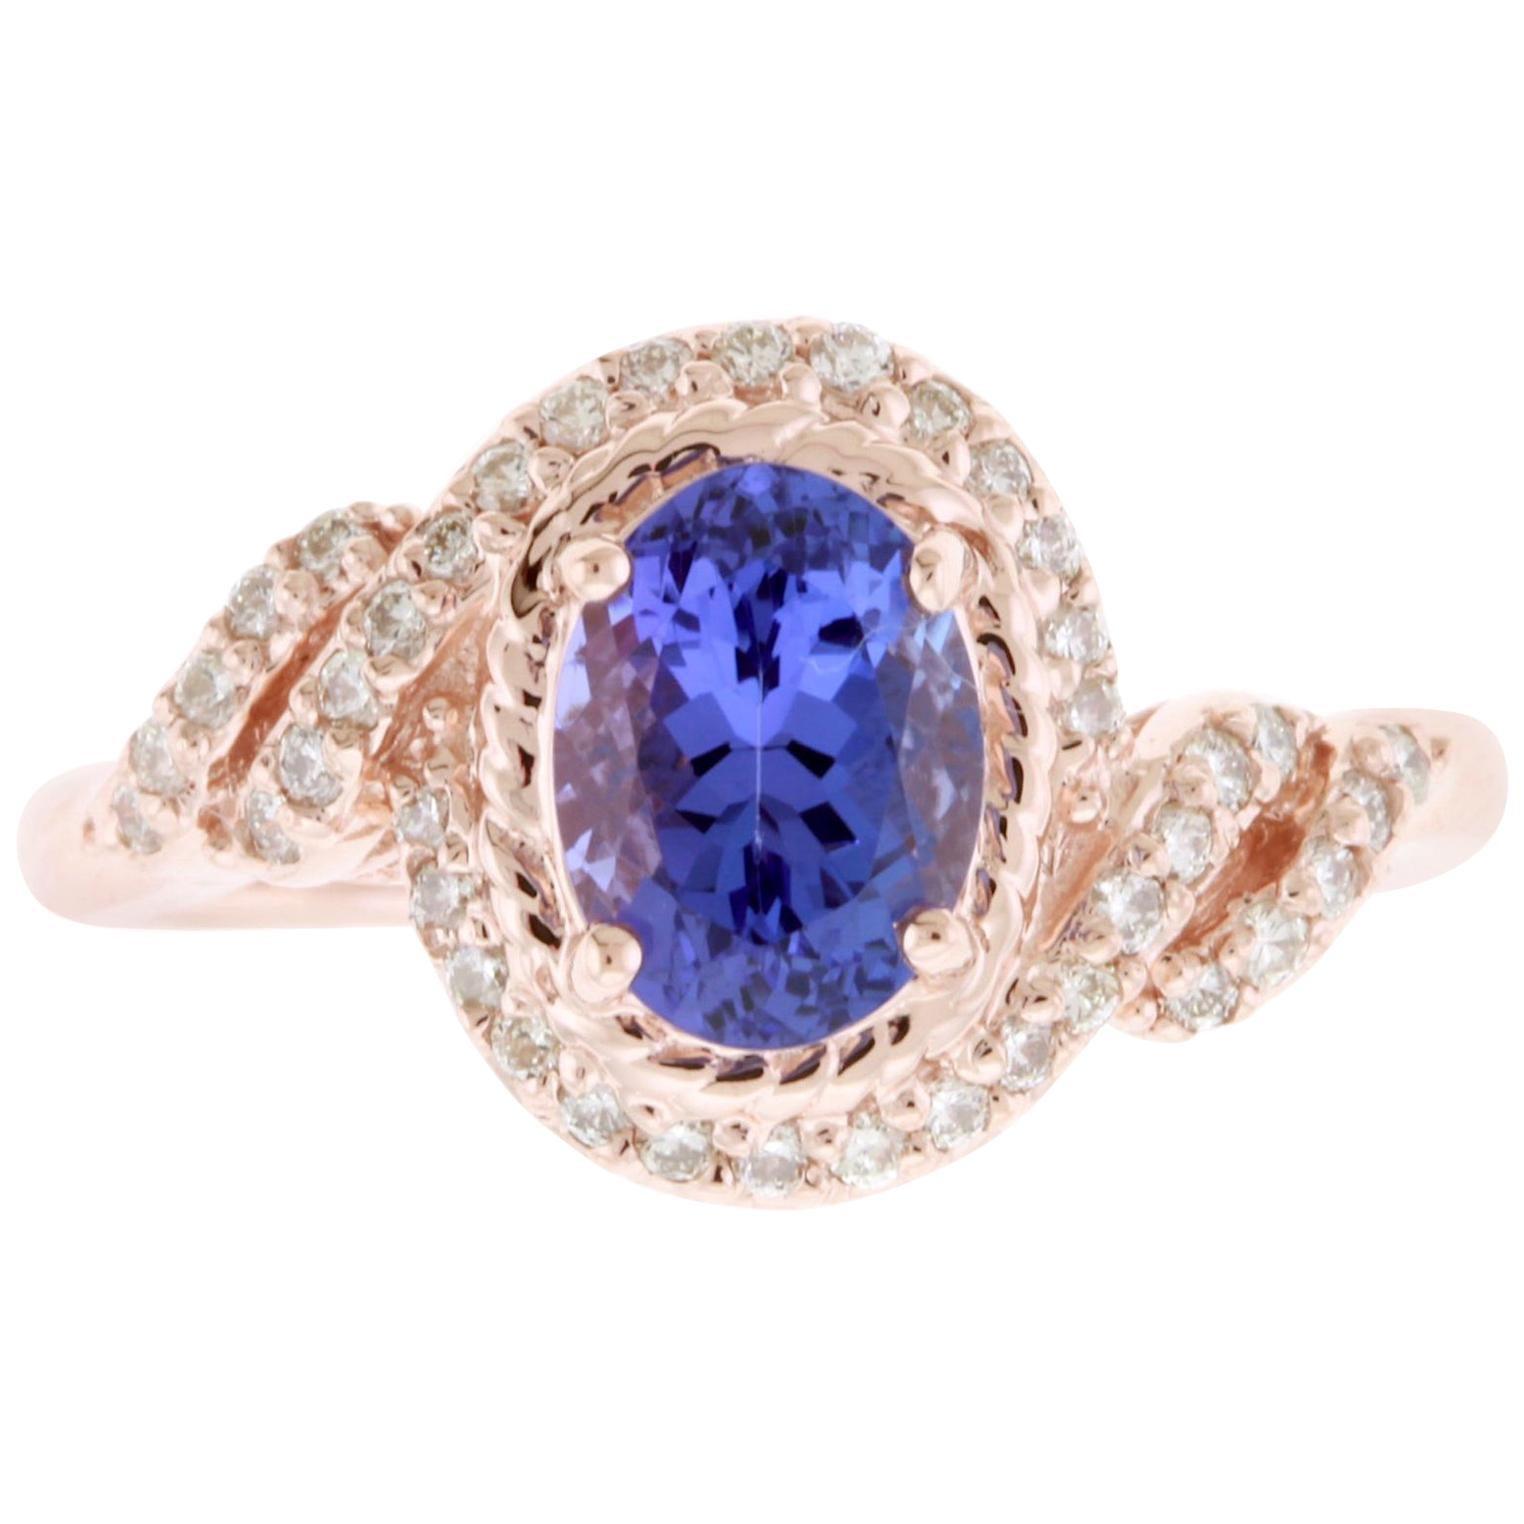 Oval Natural Tanzanite and Round White Diamond Halo Swirl Ring 14K Rose Gold